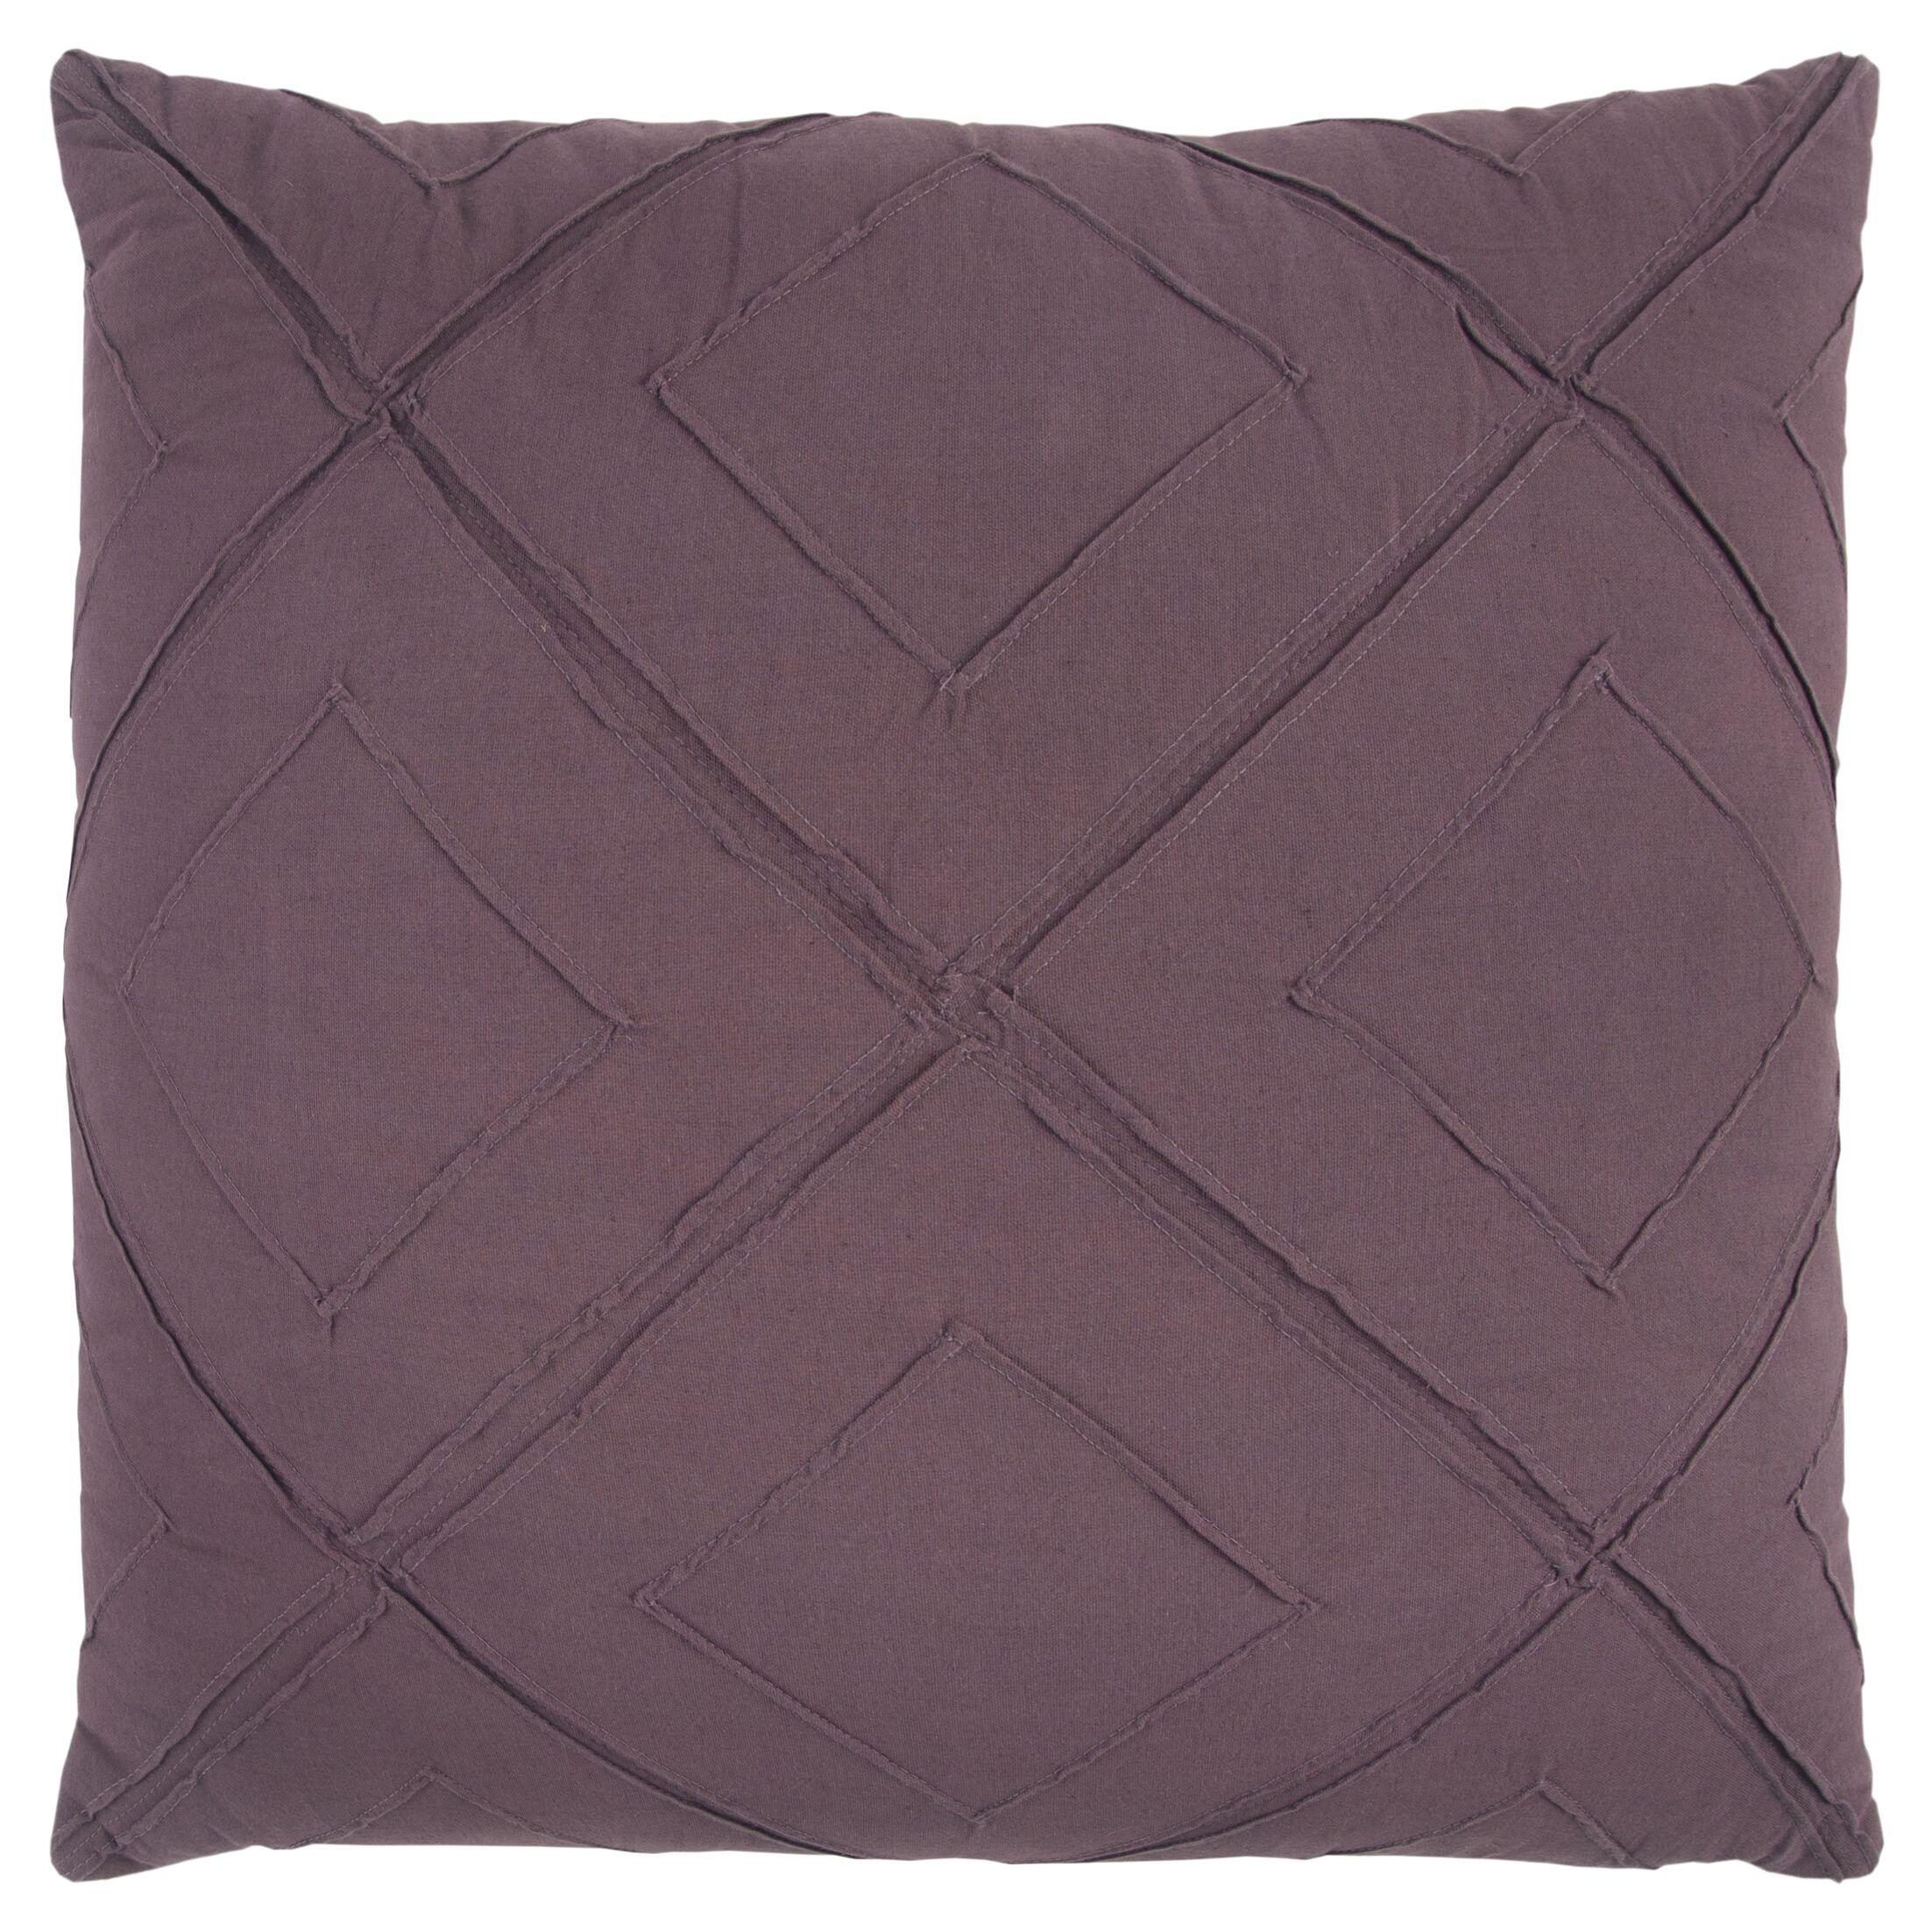 Kingsburg Decorative 100% Cotton Throw Pillow (Set of 2) Size: 20